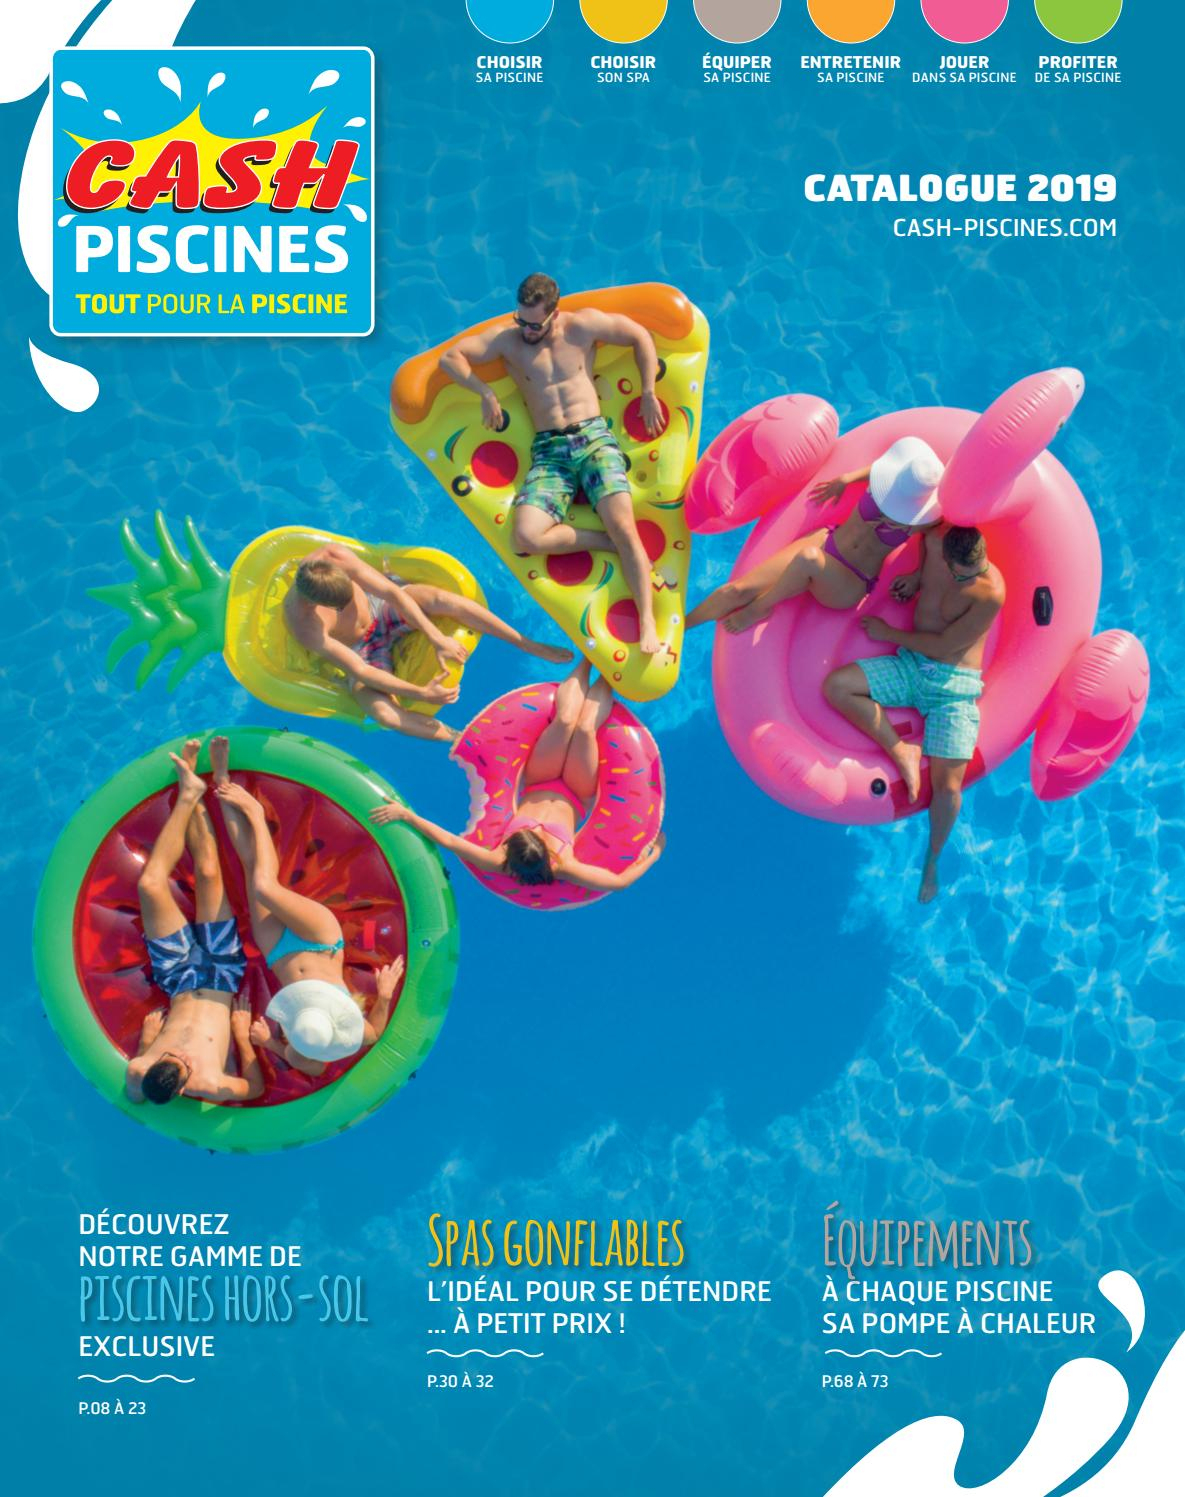 Catalogue Cash Piscines 2019 By Cashpiscines2 - Issuu serapportantà Cash Piscine Manosque